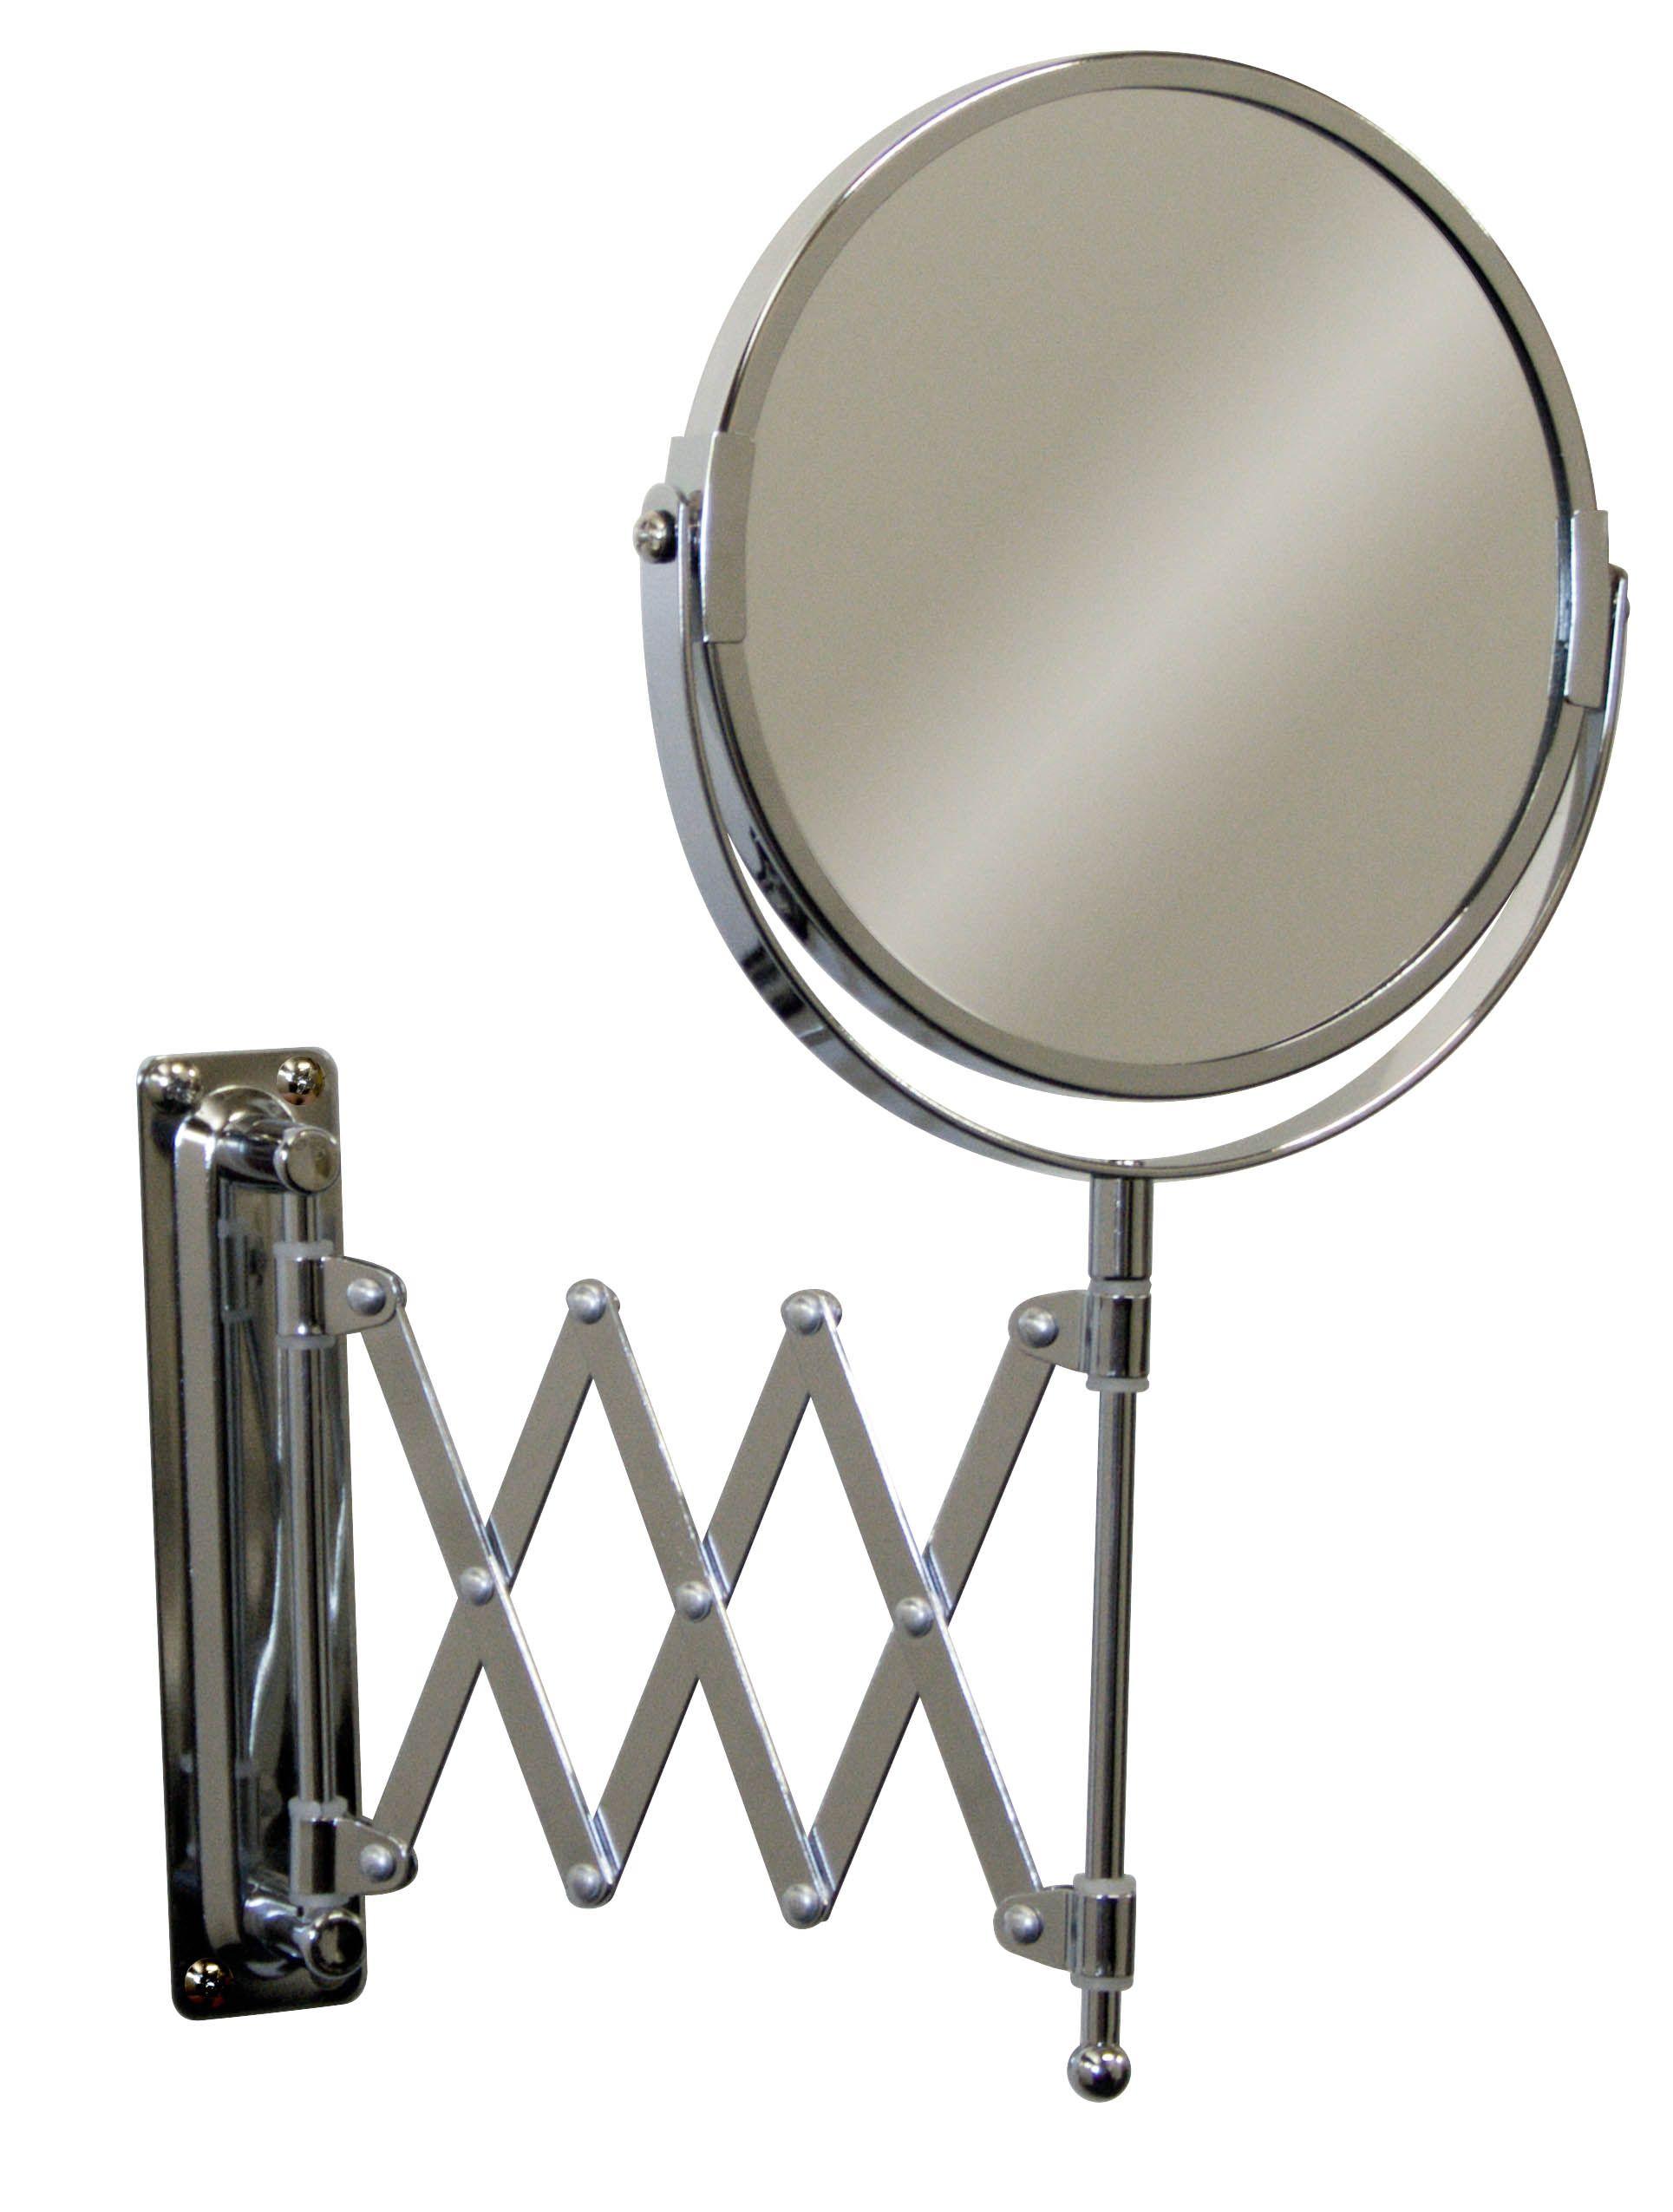 Best Design Harmonica cosmeticaspiegel 15cm